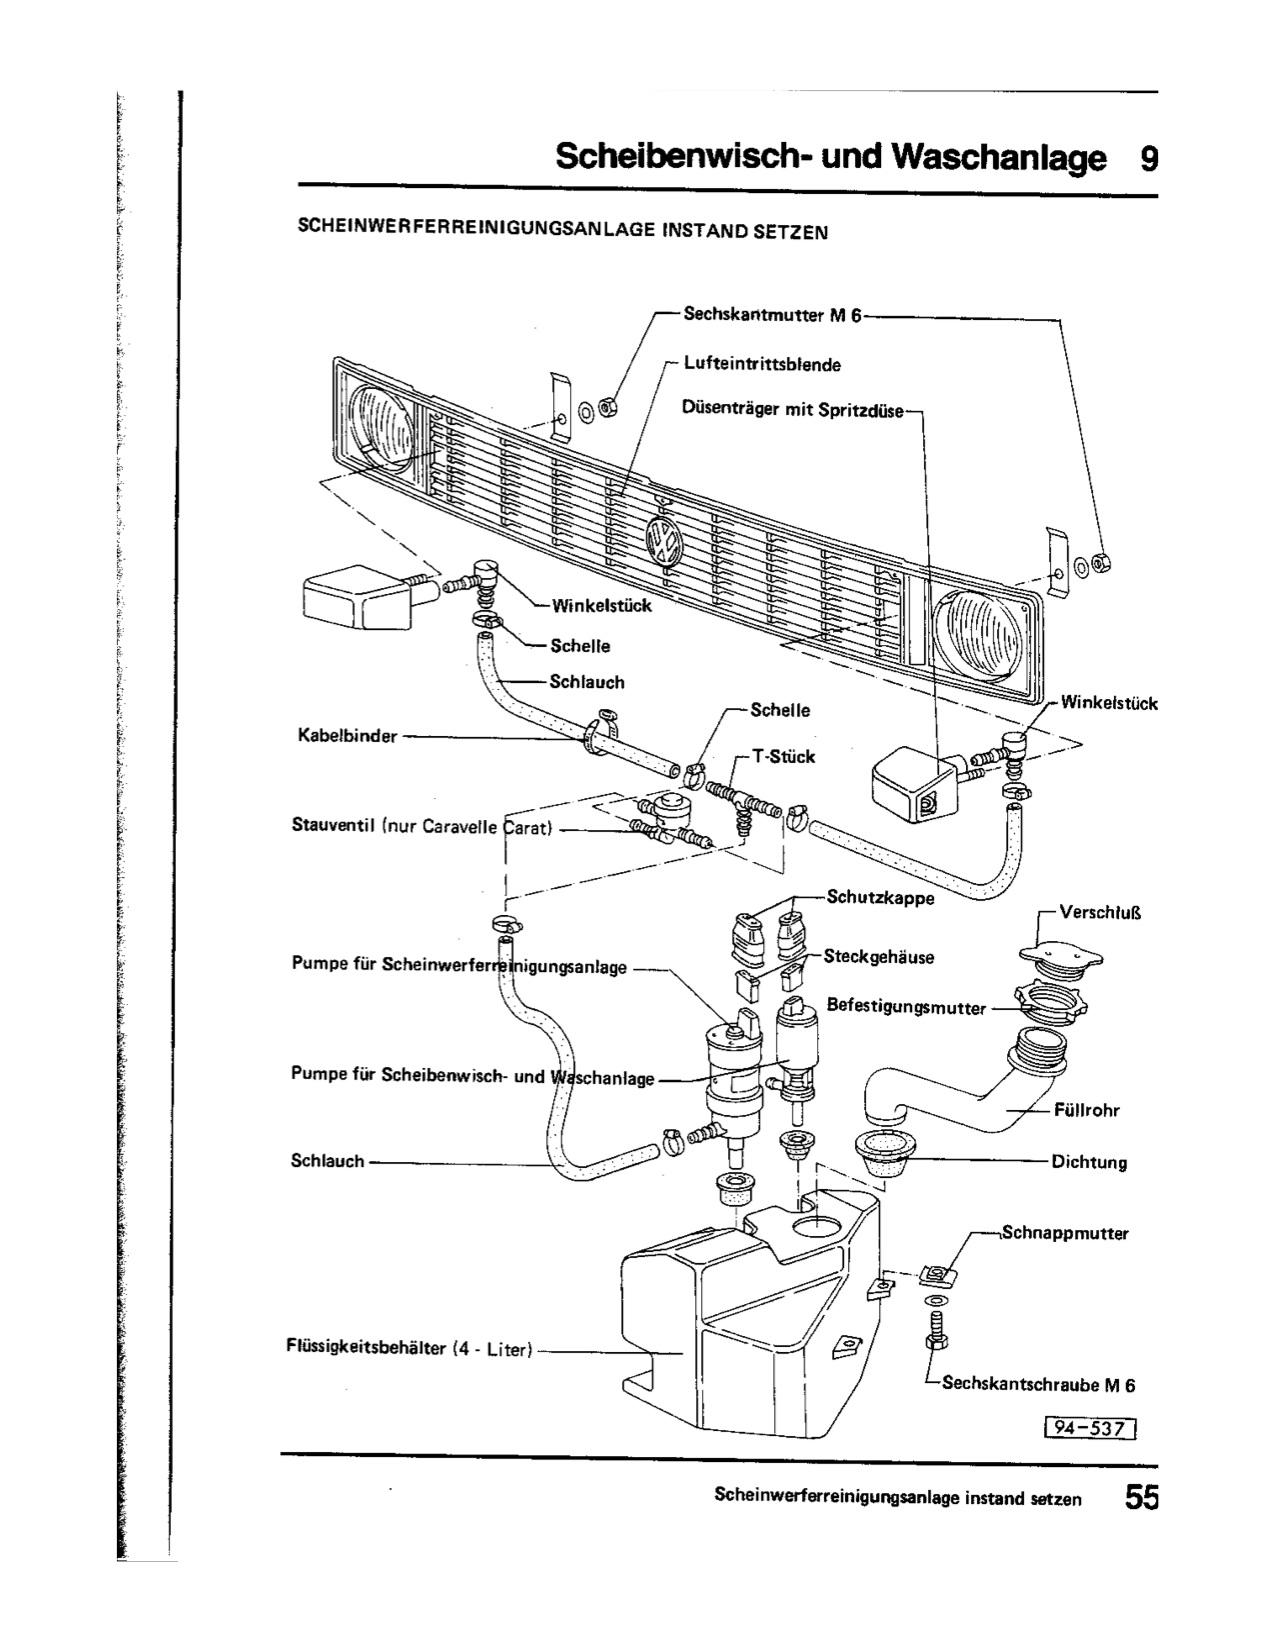 corrado headlight wiring diagram